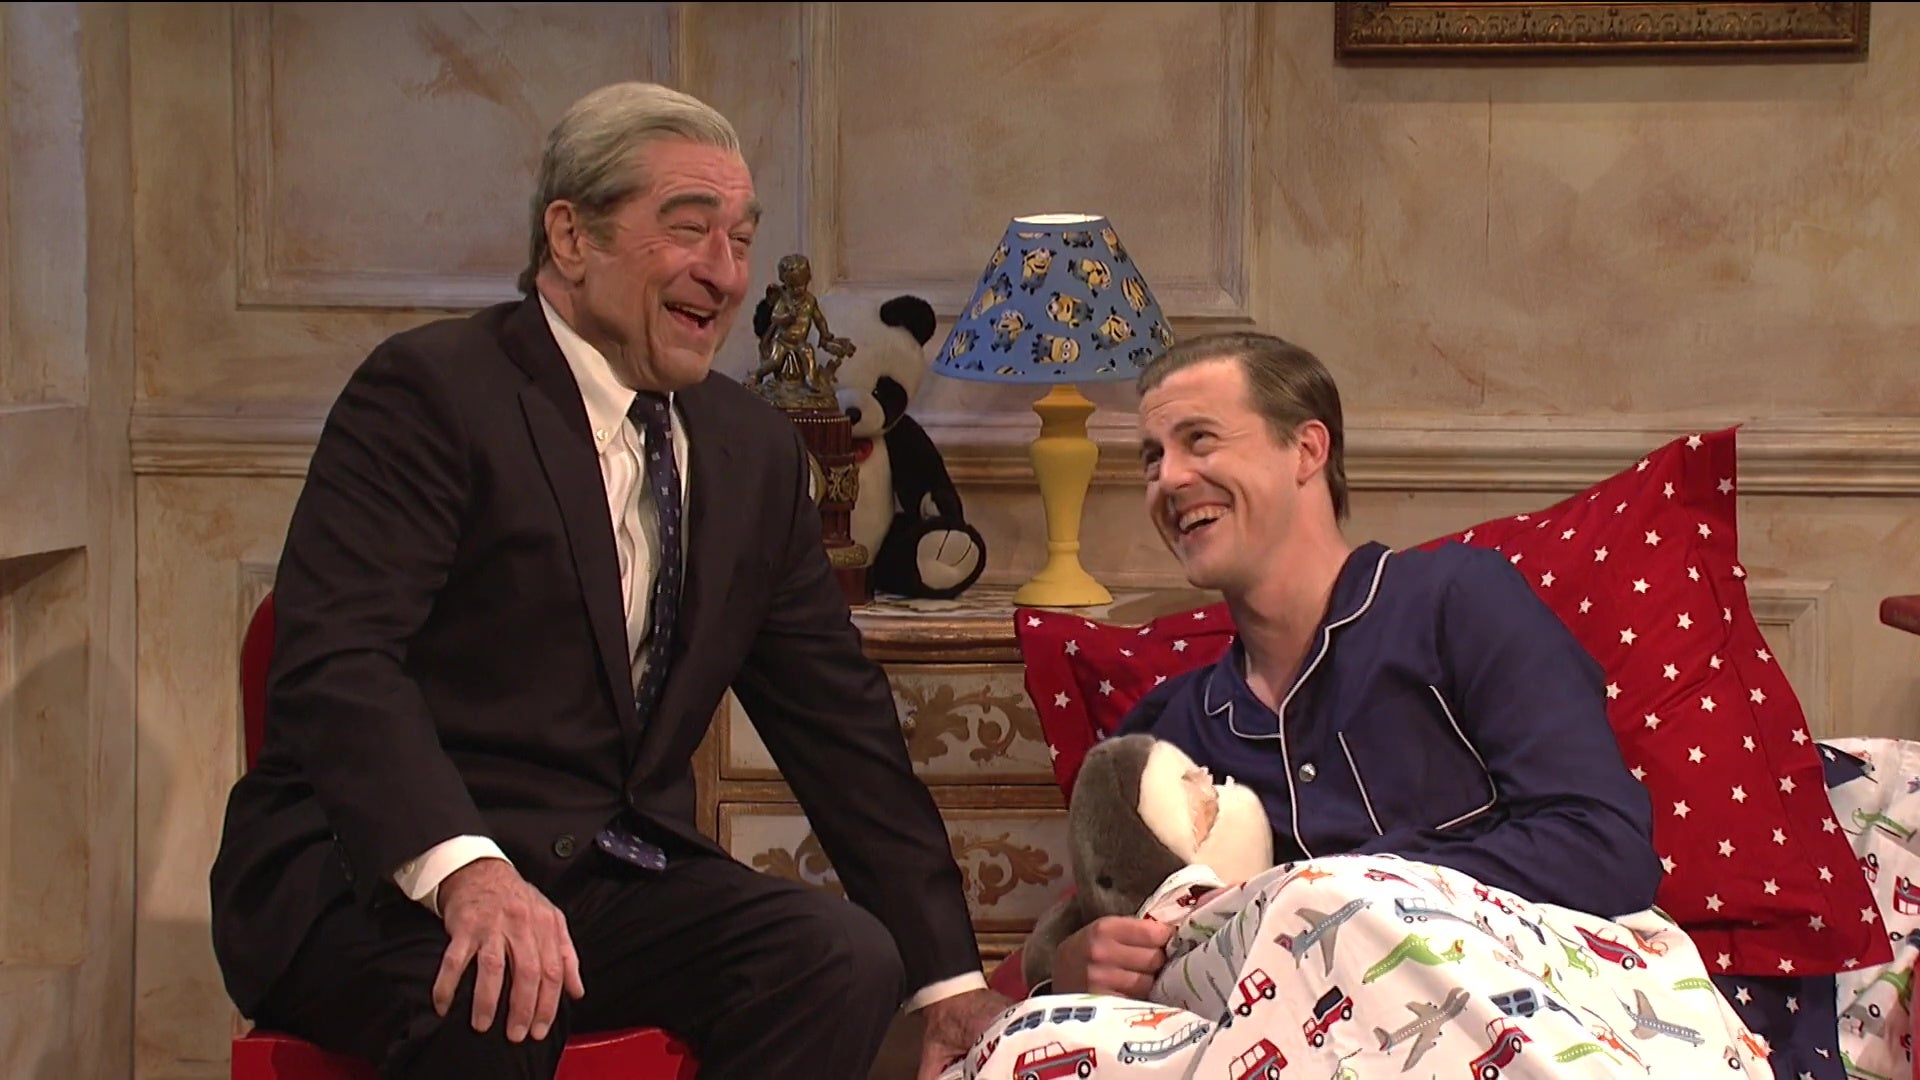 Robert De Niro and Alex Moffat laughing on Saturday Night Live.